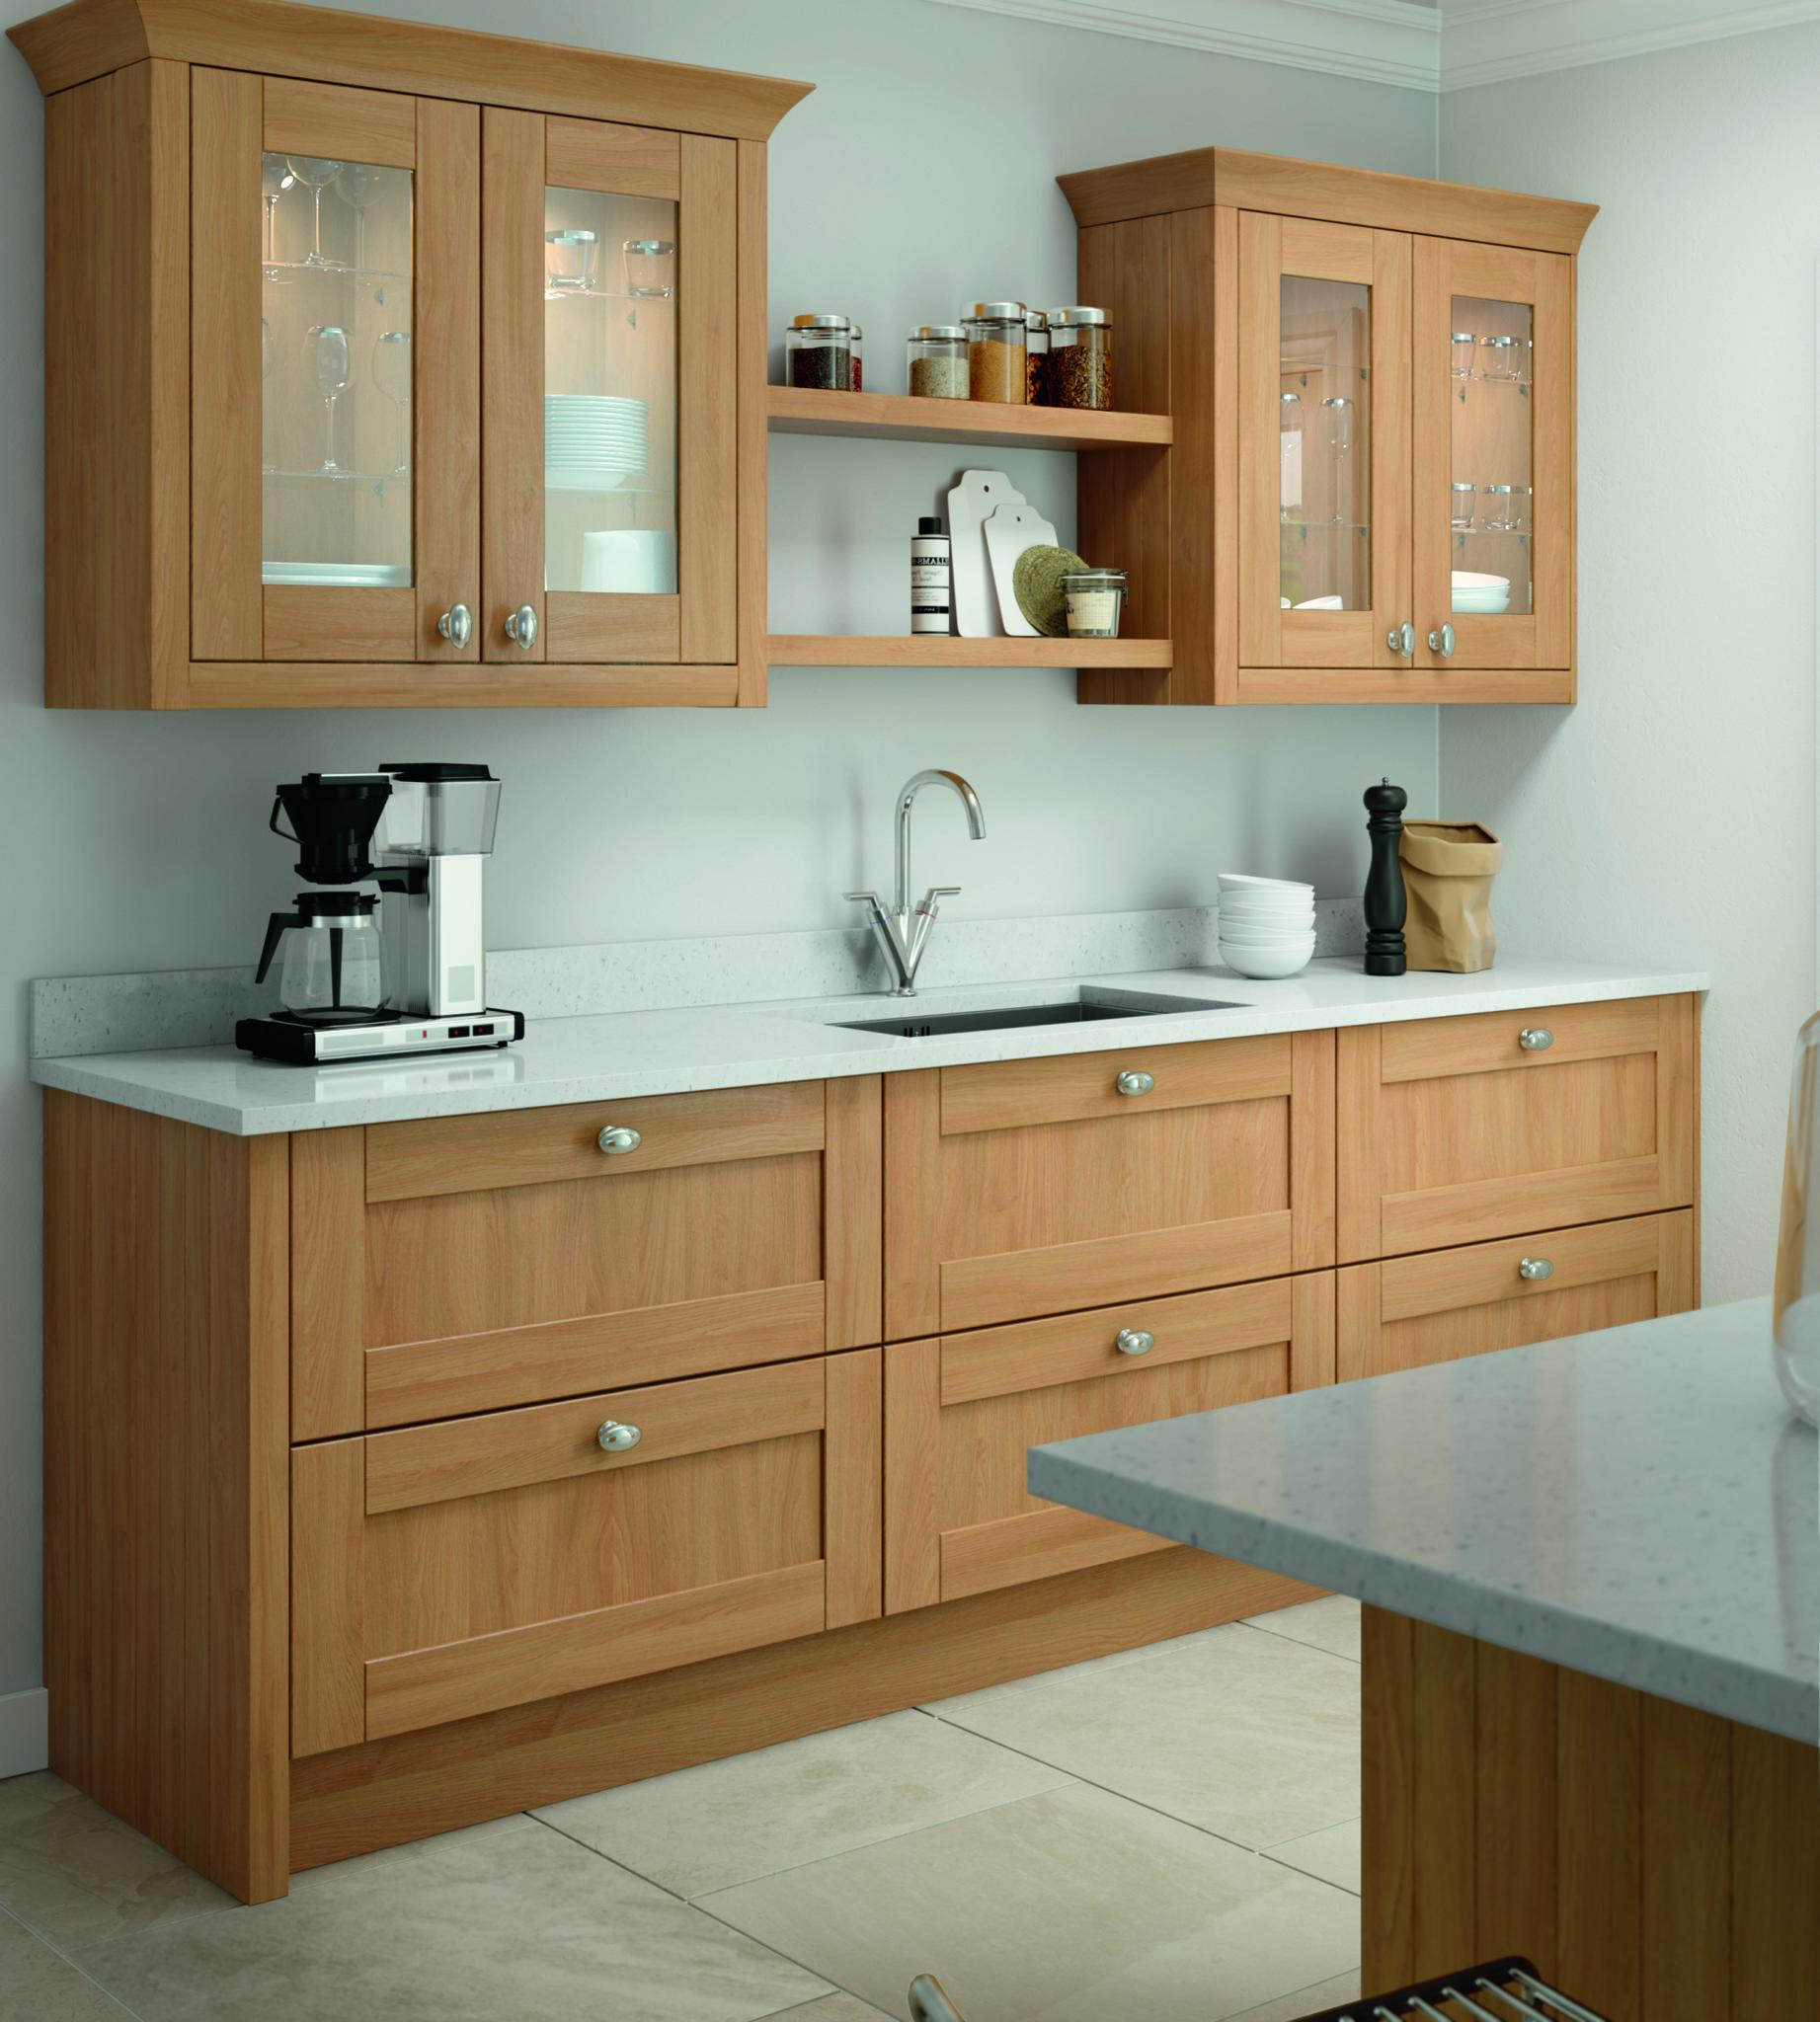 Kitchen Cabinet Doors Shaker Style: Shaker Style Kitchen Cabinet Doors